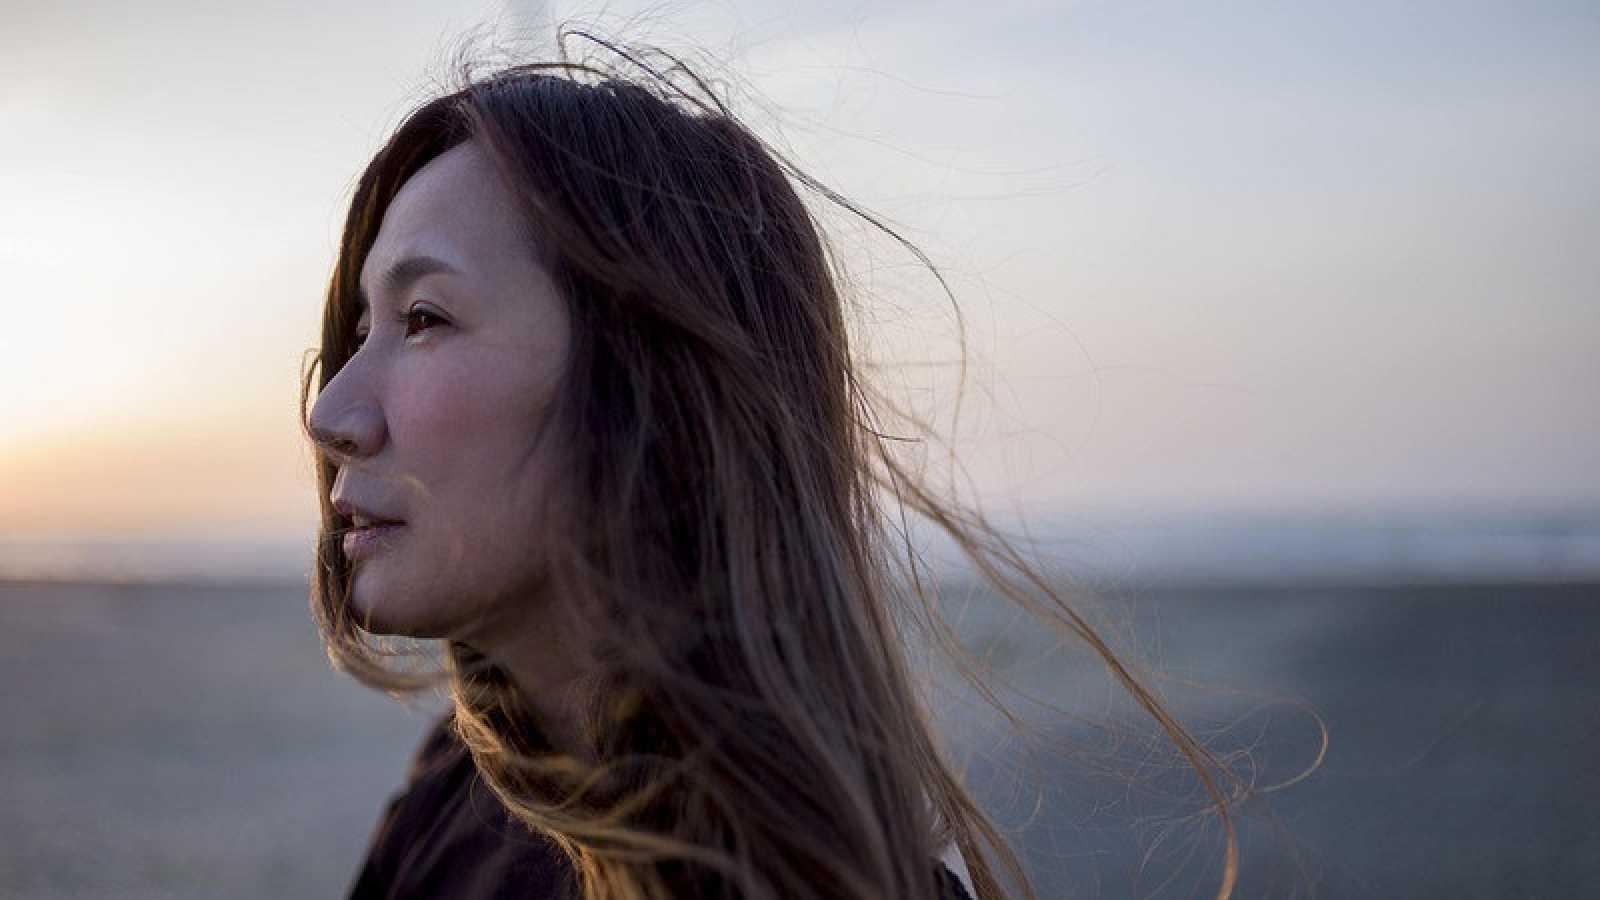 Neues Release von Arai Akino © FlyingDog, Inc. All rights reserved.